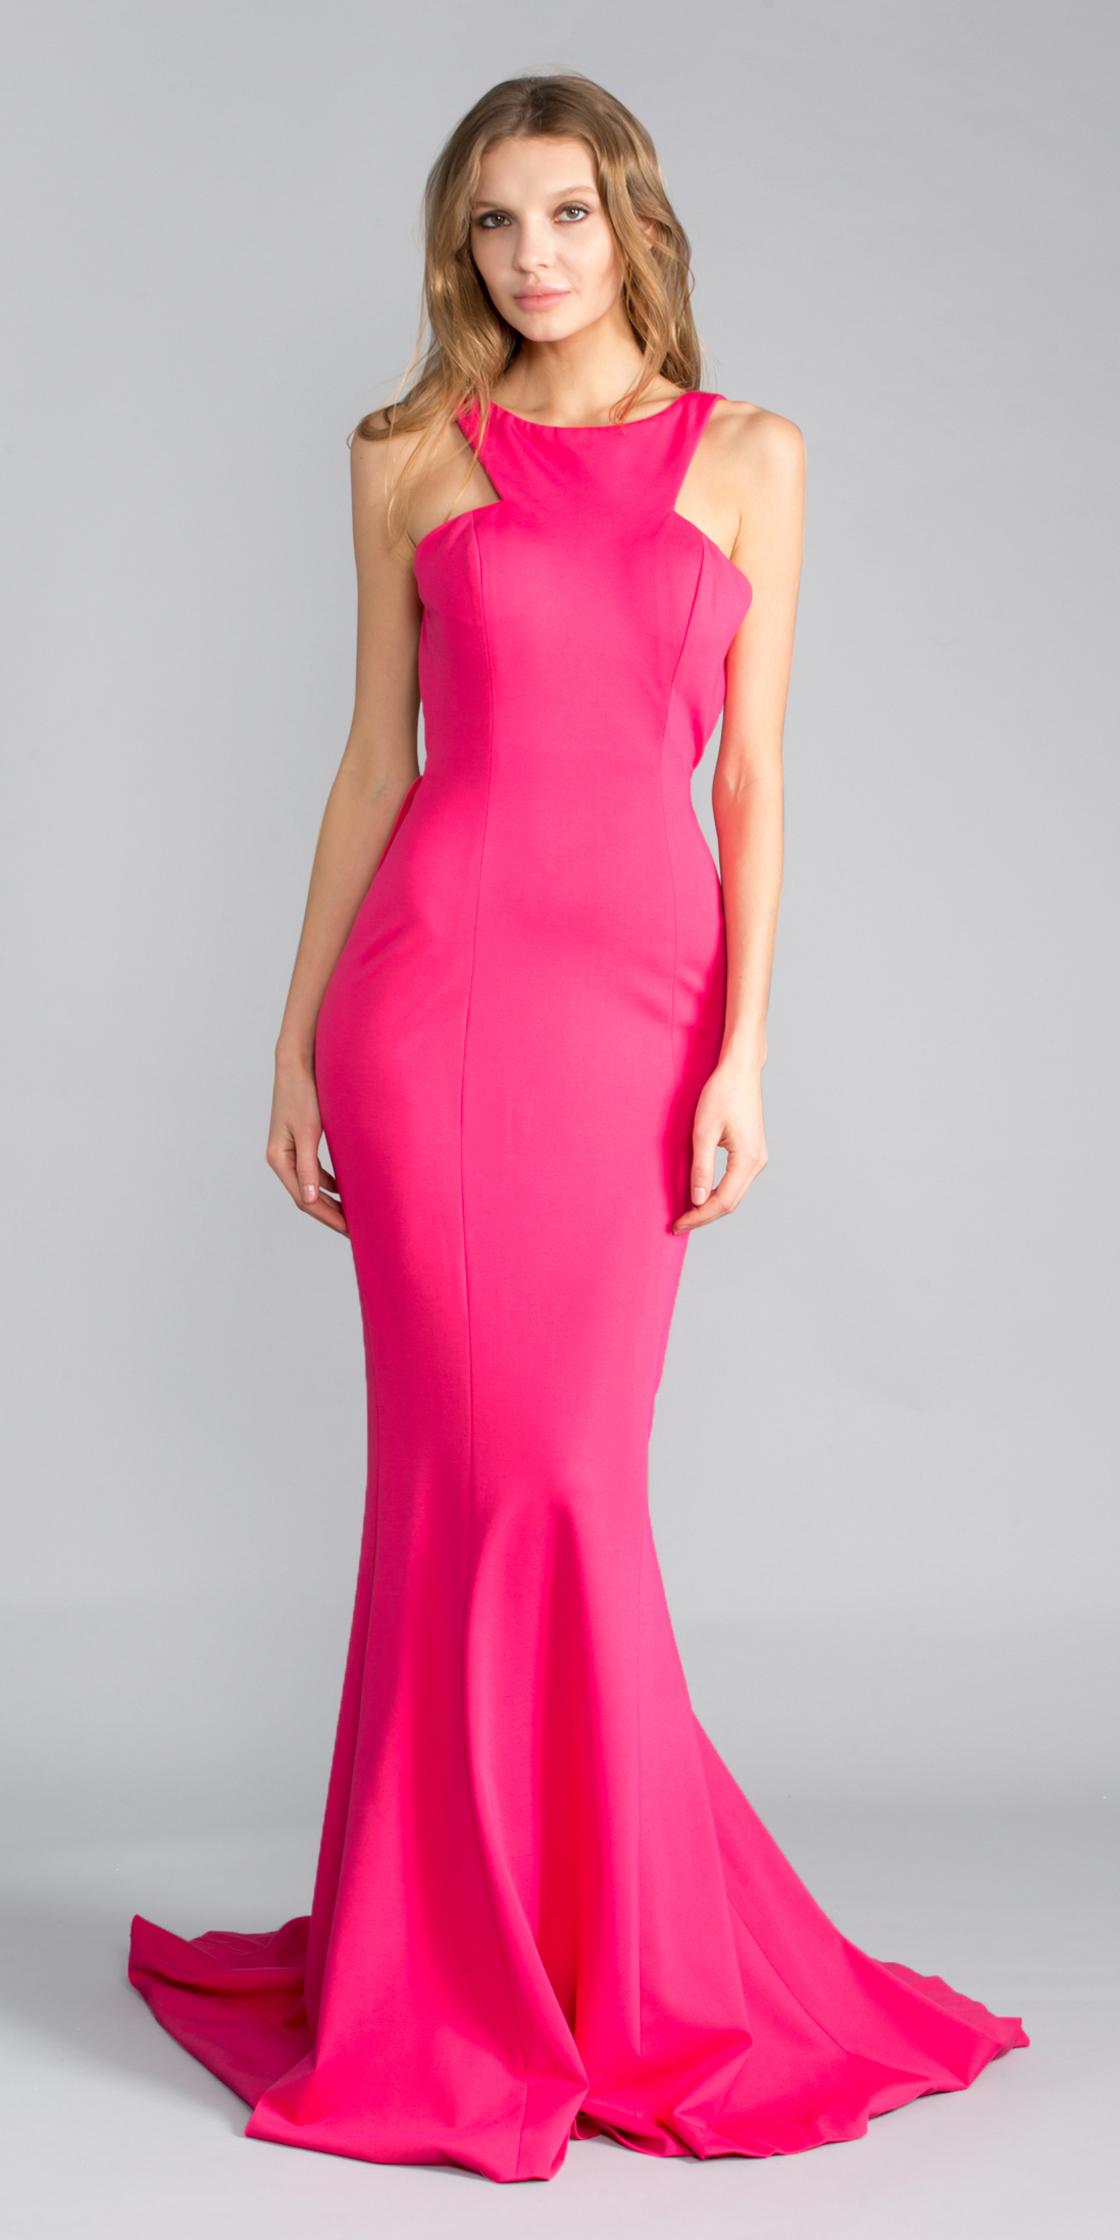 Encantador Backless Mermaid Wedding Dress Embellecimiento ...